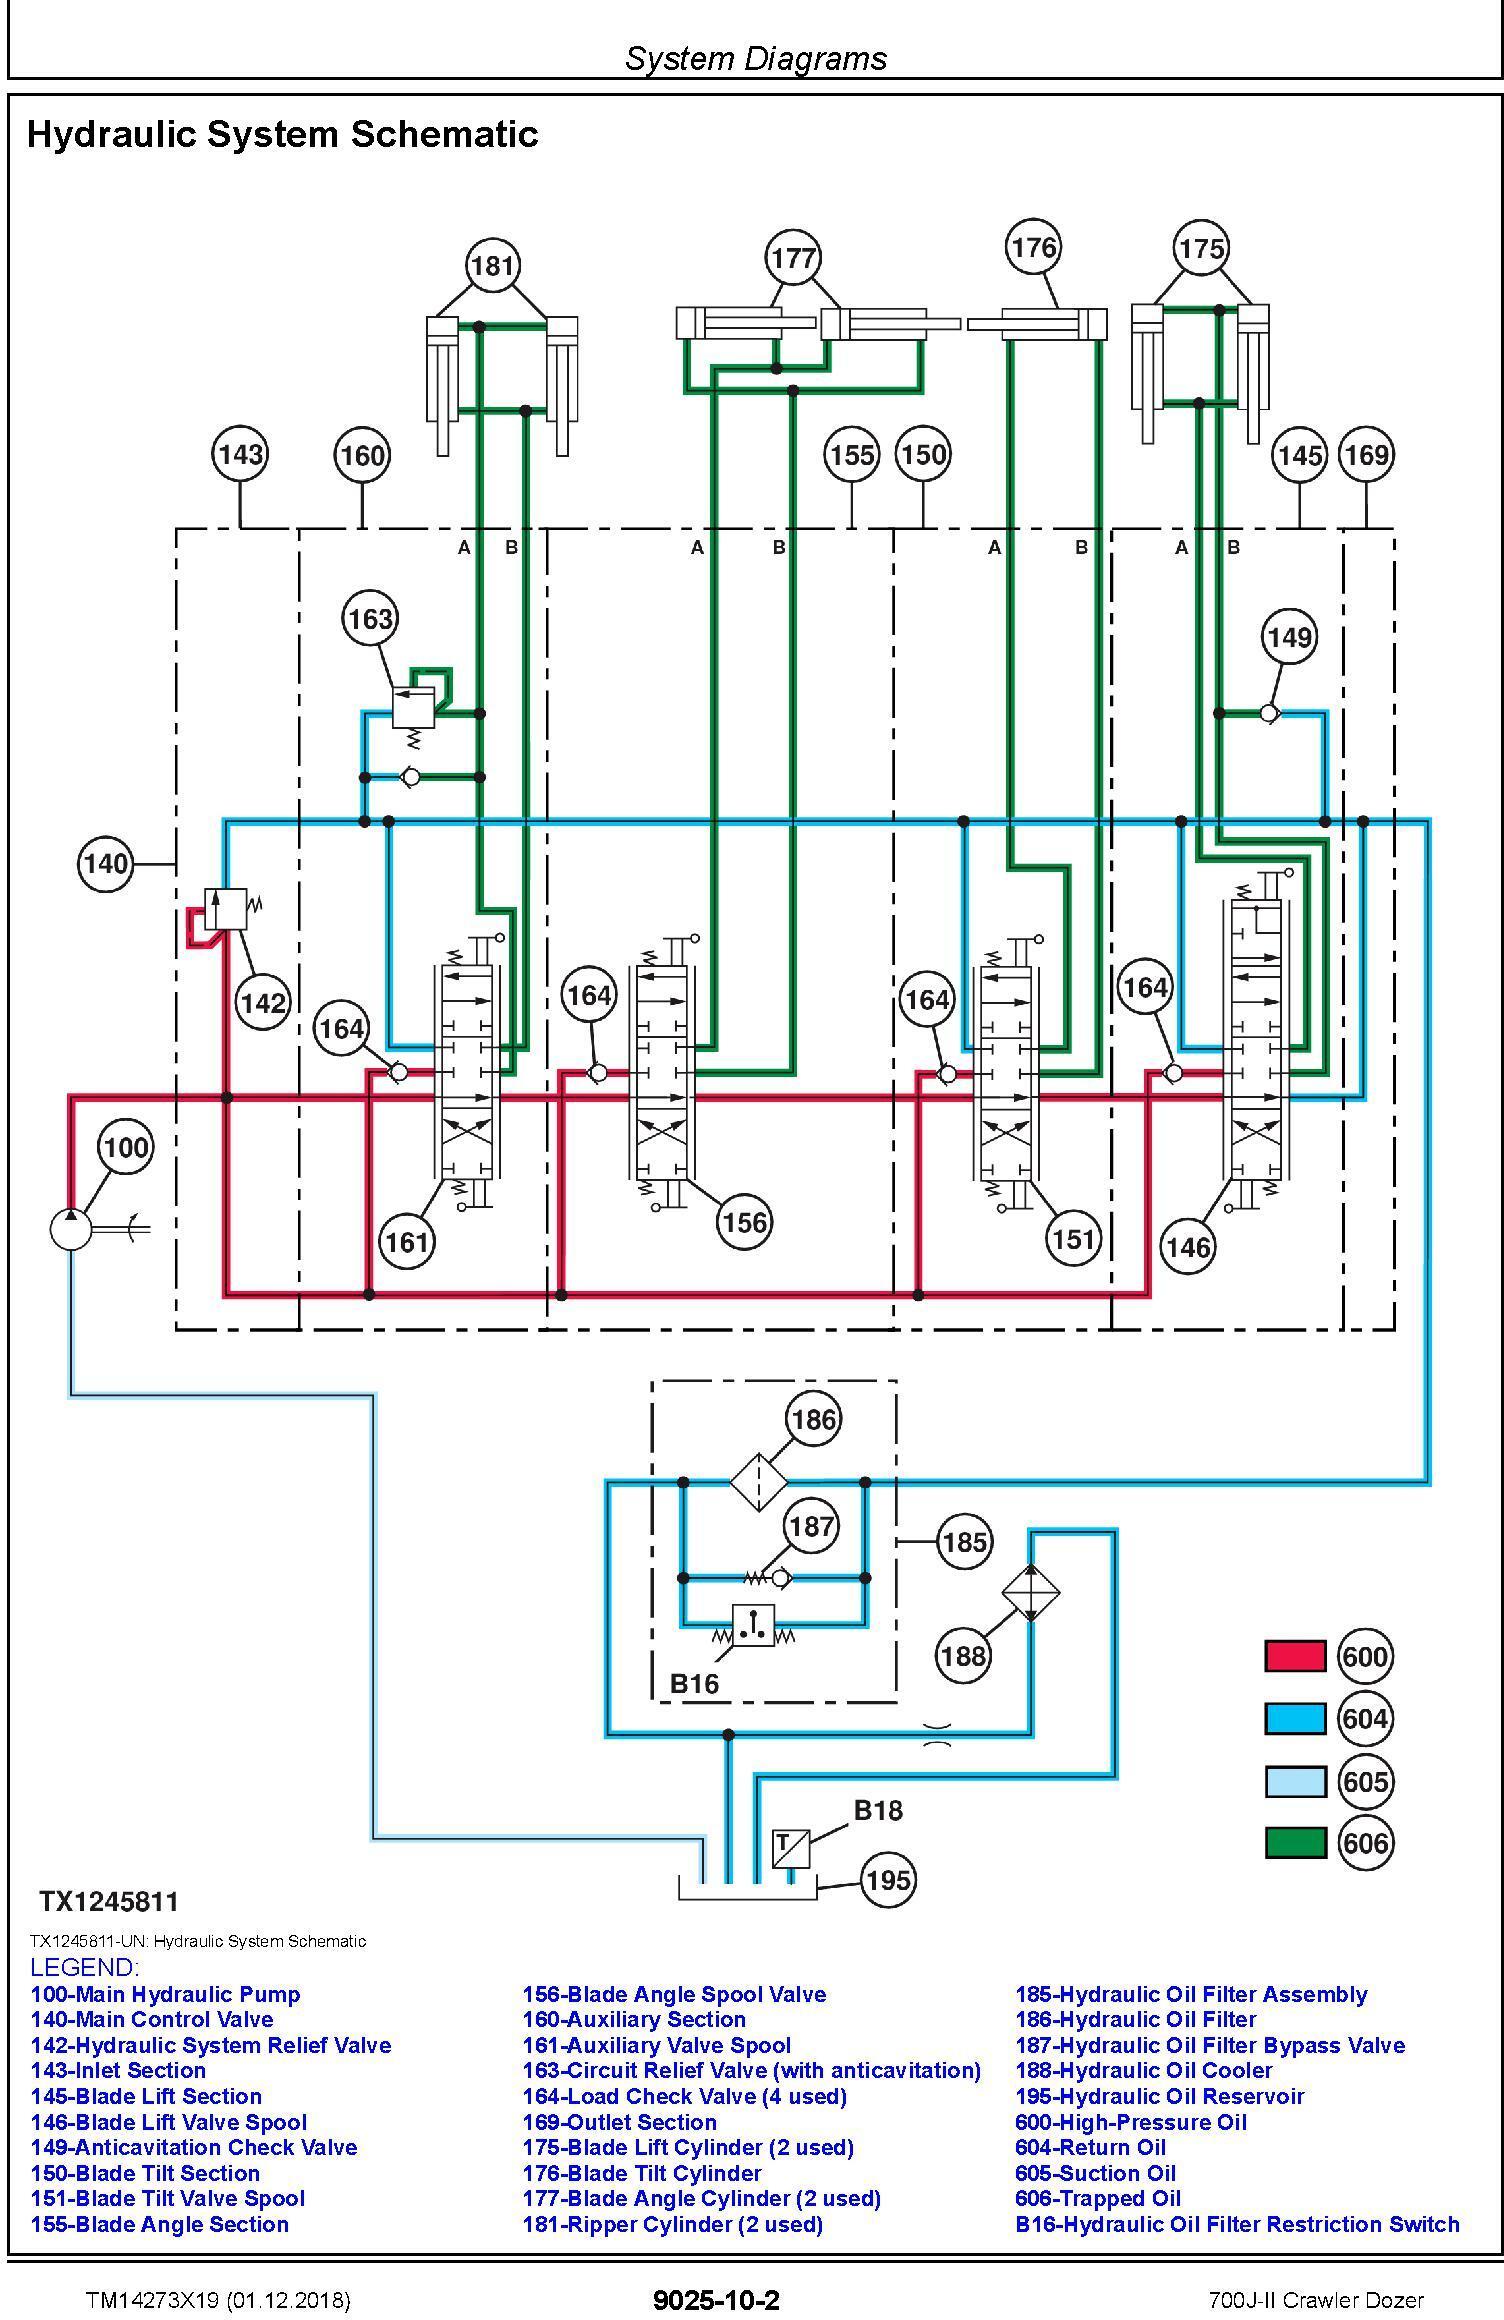 John Deere 700J-II (SN. D000001-) Crawler Dozer Operation & Test Technical Manual (TM14273X19) - 3